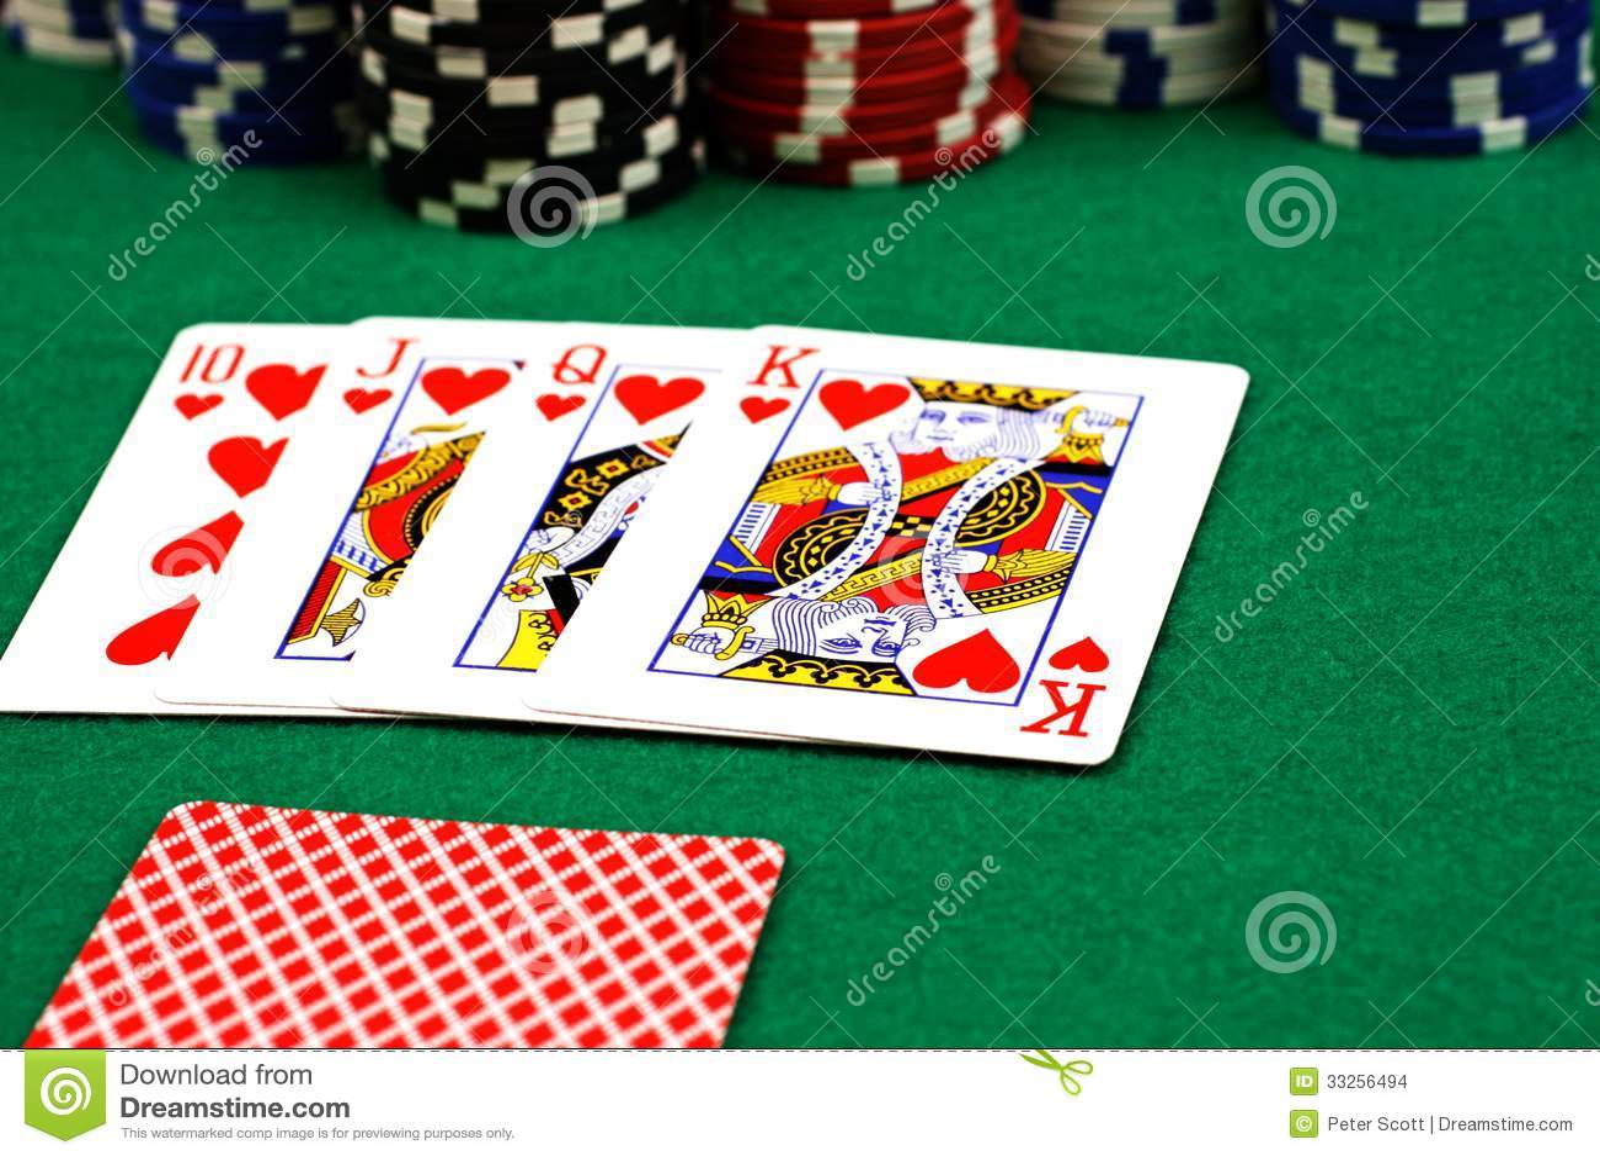 mr.green casino poker cowboy